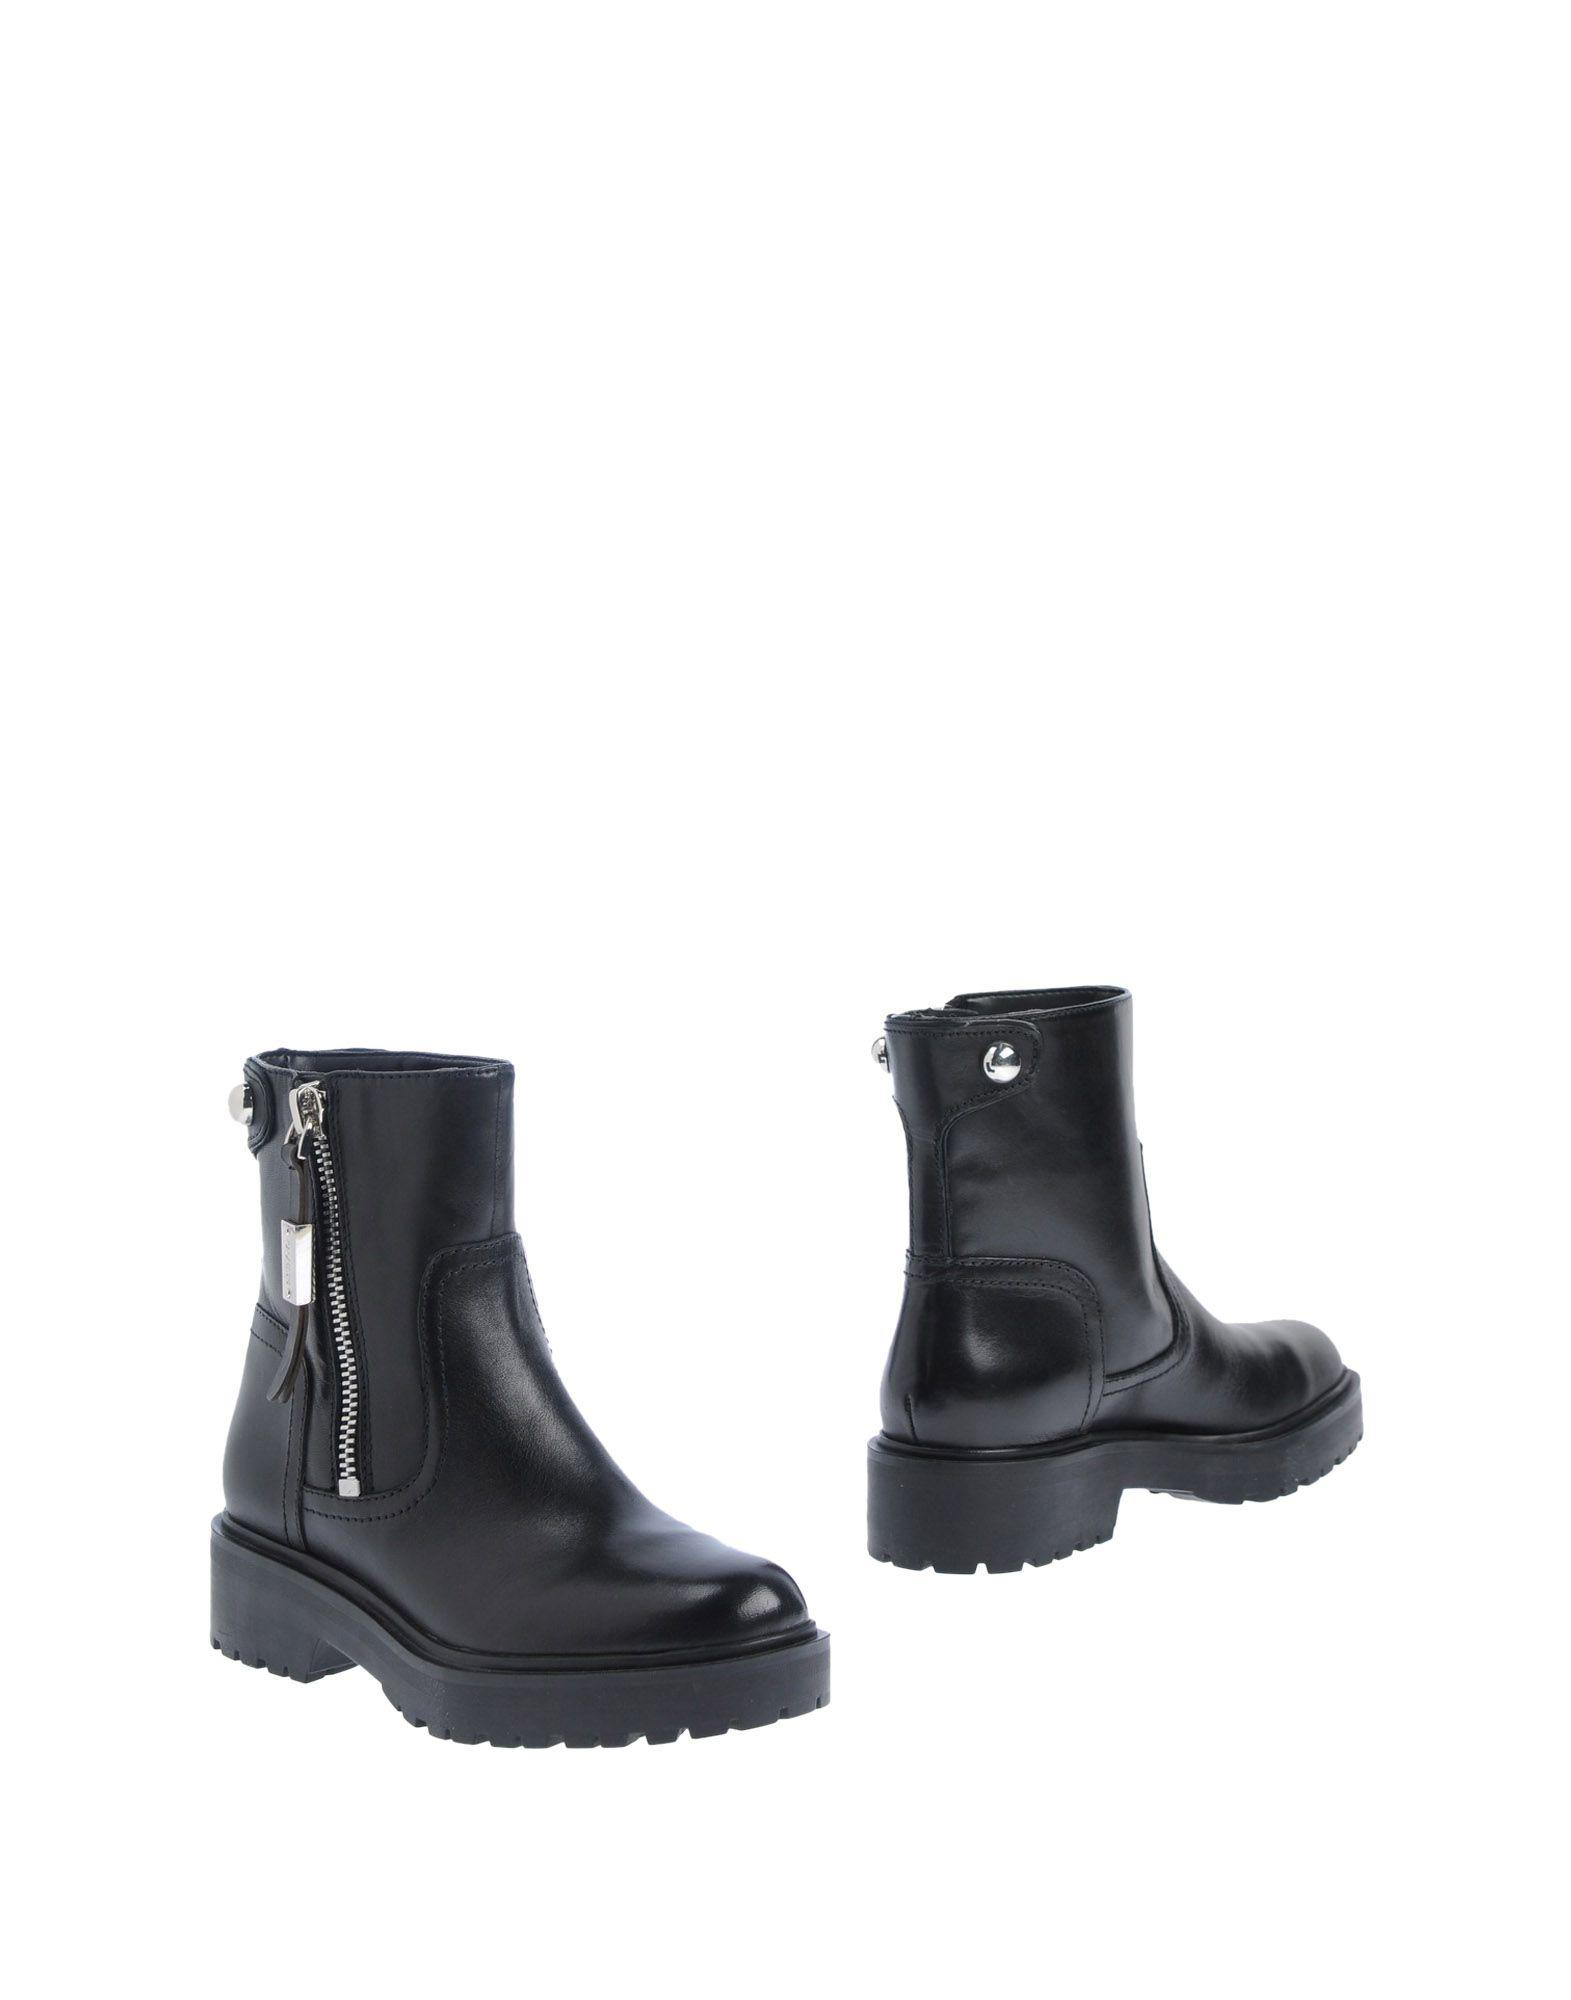 11509059EG Guess Stiefelette Damen  11509059EG  Heiße Schuhe 408c7d